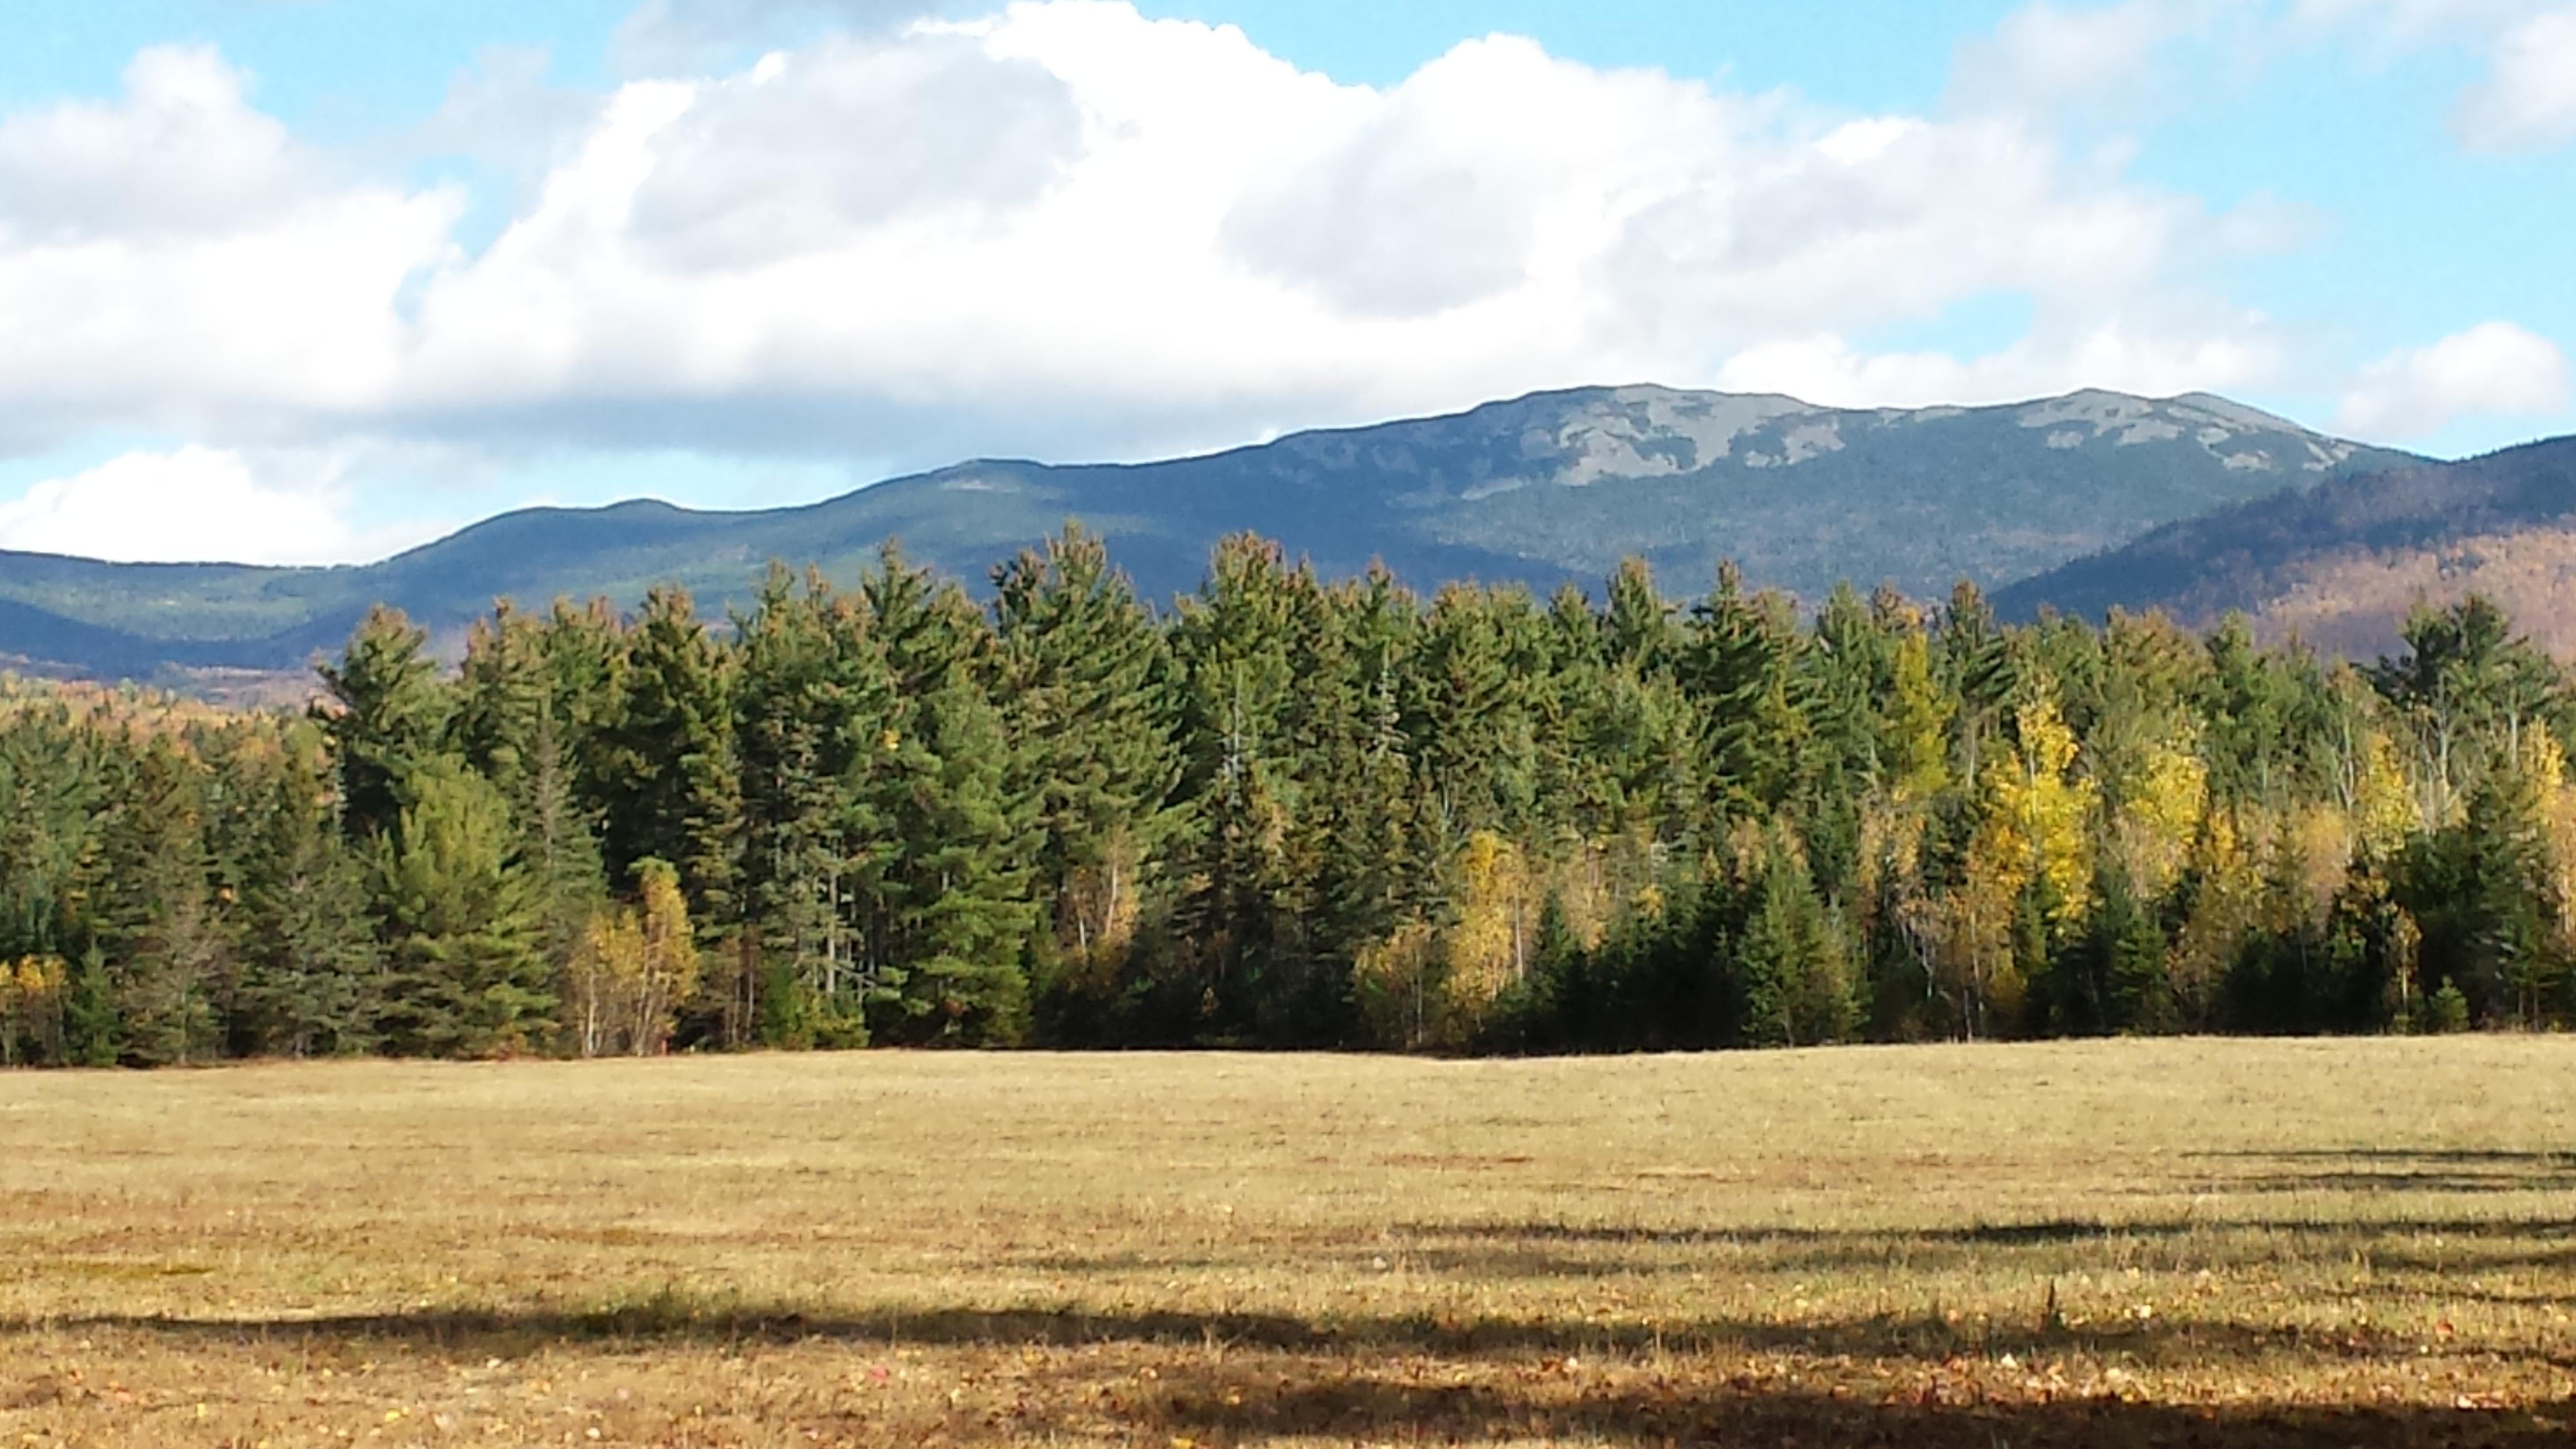 Mount Abraham from the Perham Stream Birding Trail.